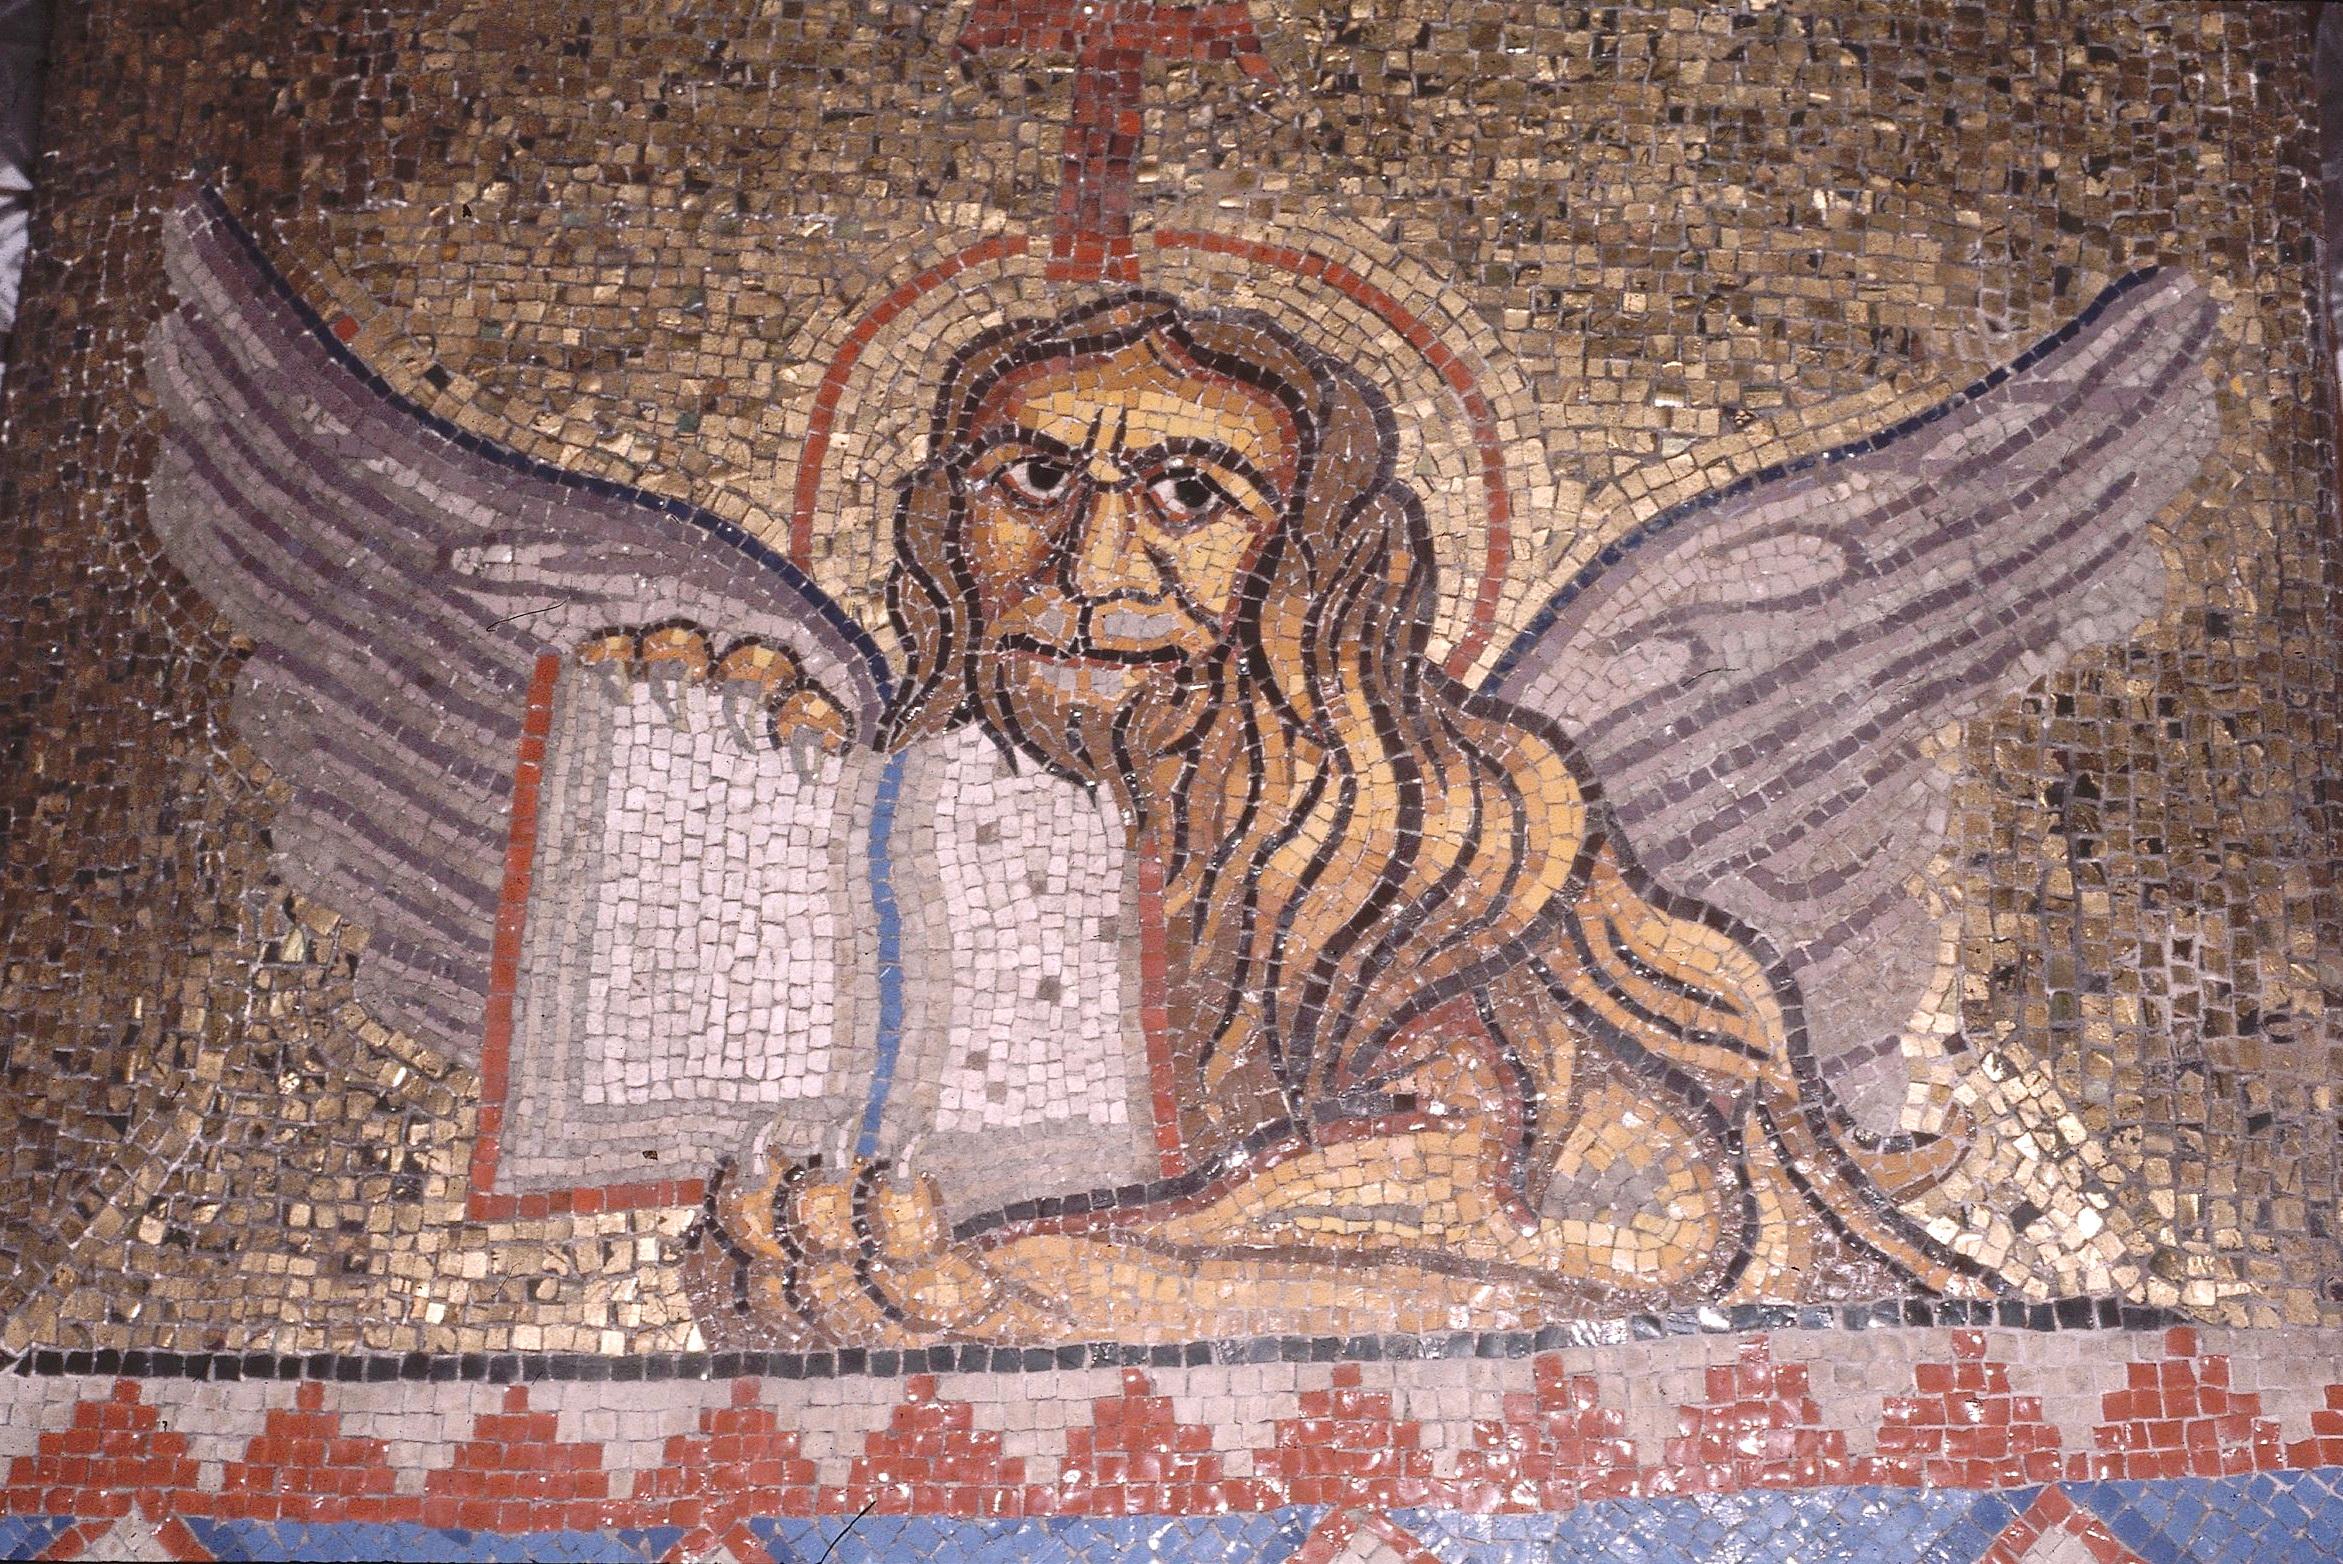 http://www.ruicon.ru/images/arts/mosaics/13993265.jpg